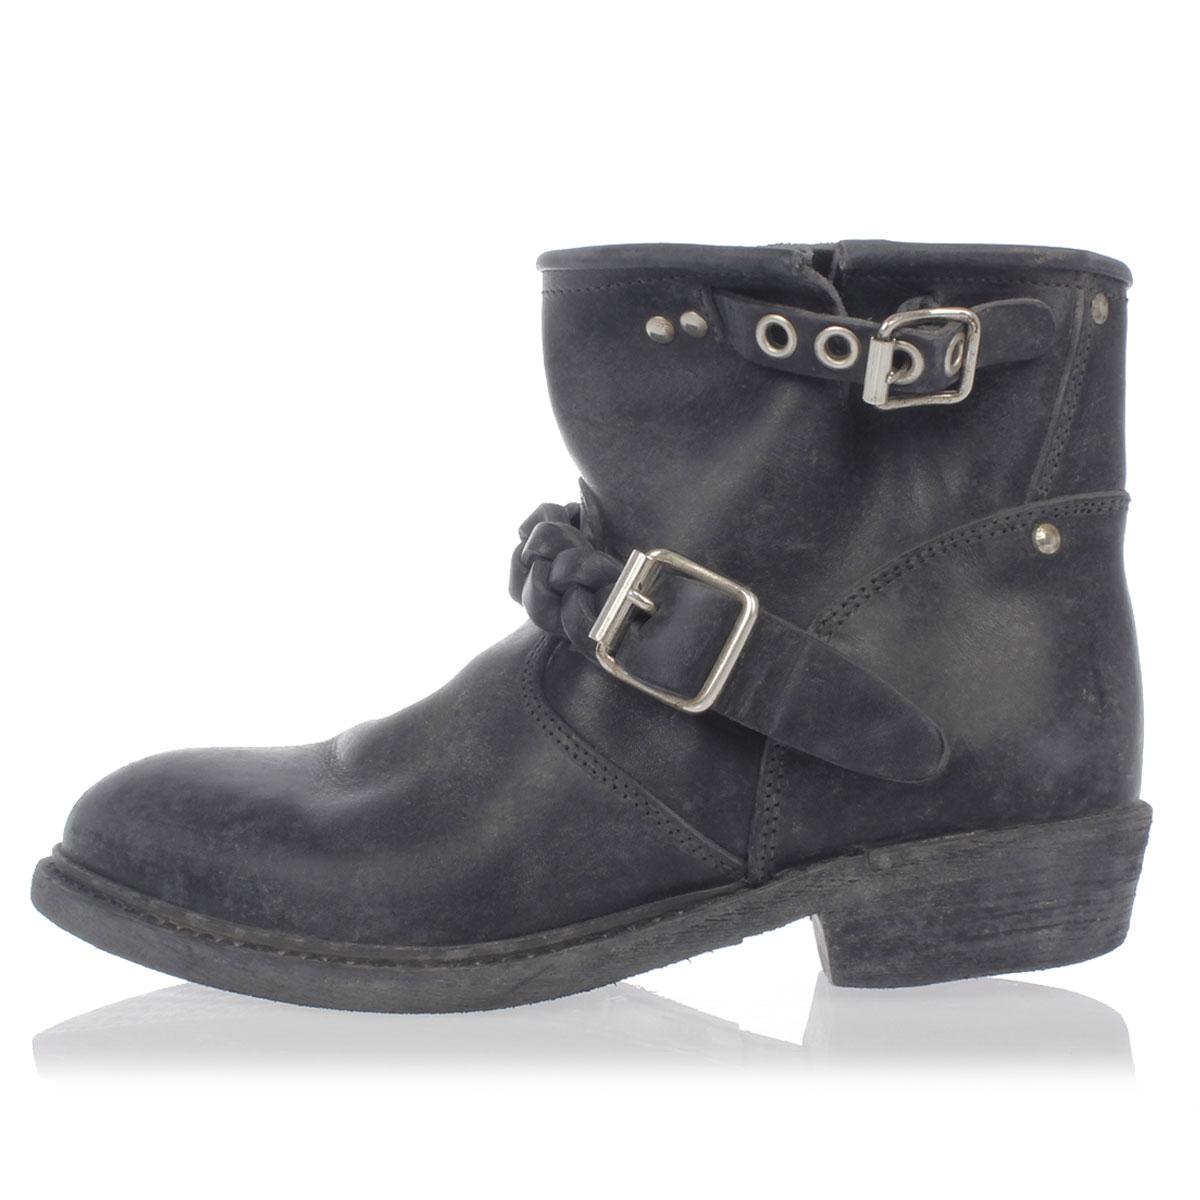 golden goose women leather biker boot with buckles glamood outlet. Black Bedroom Furniture Sets. Home Design Ideas